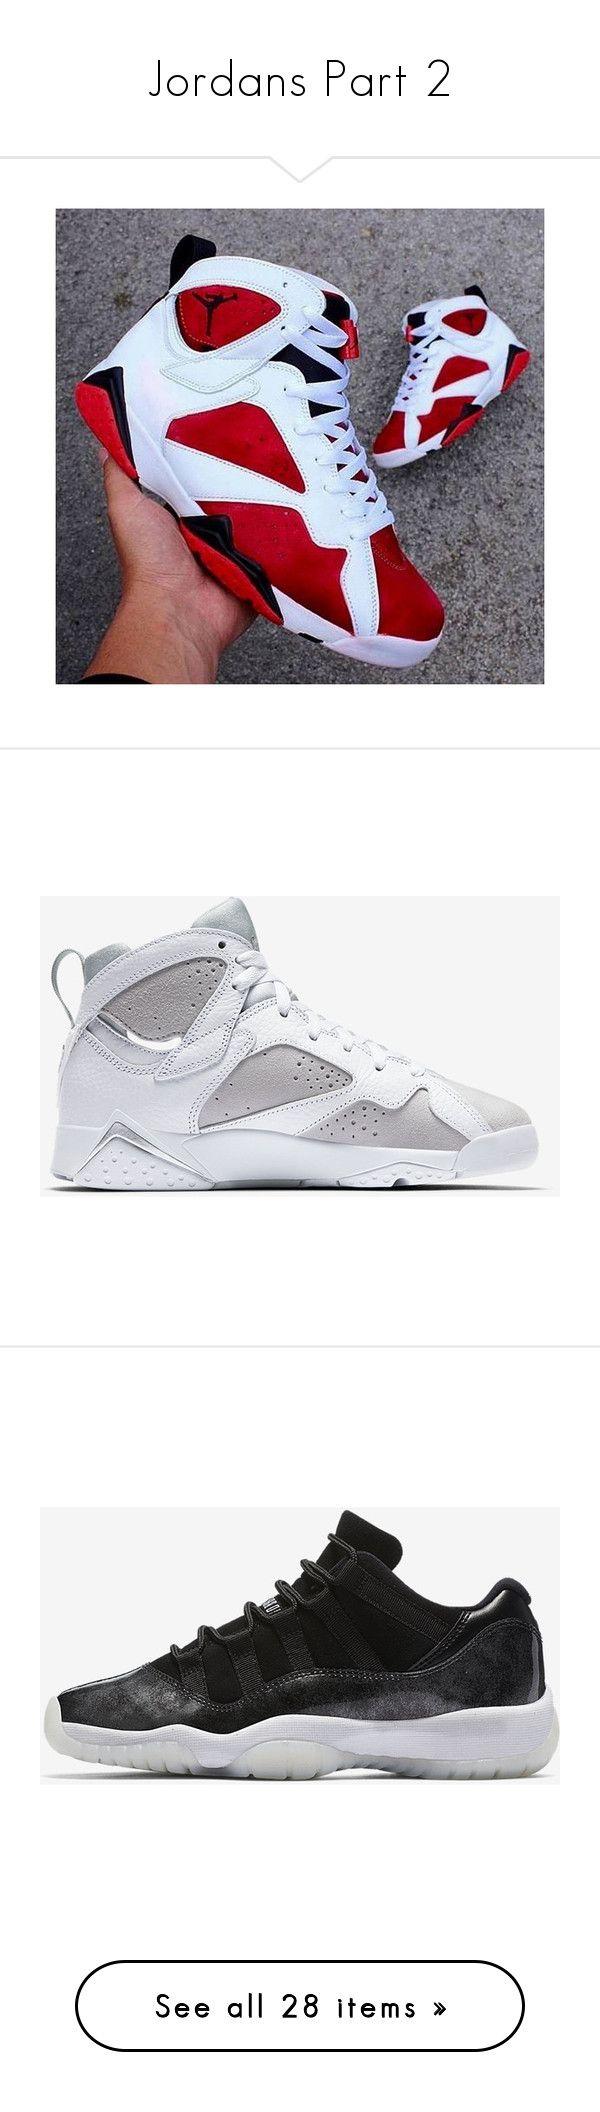 """Jordans Part 2"" by nasza100 ❤ liked on Polyvore featuring shoes, jordans, sneakers, jordan, men's fashion, men's shoes, men's sneakers, nike, mens retro shoes and nike mens shoes"